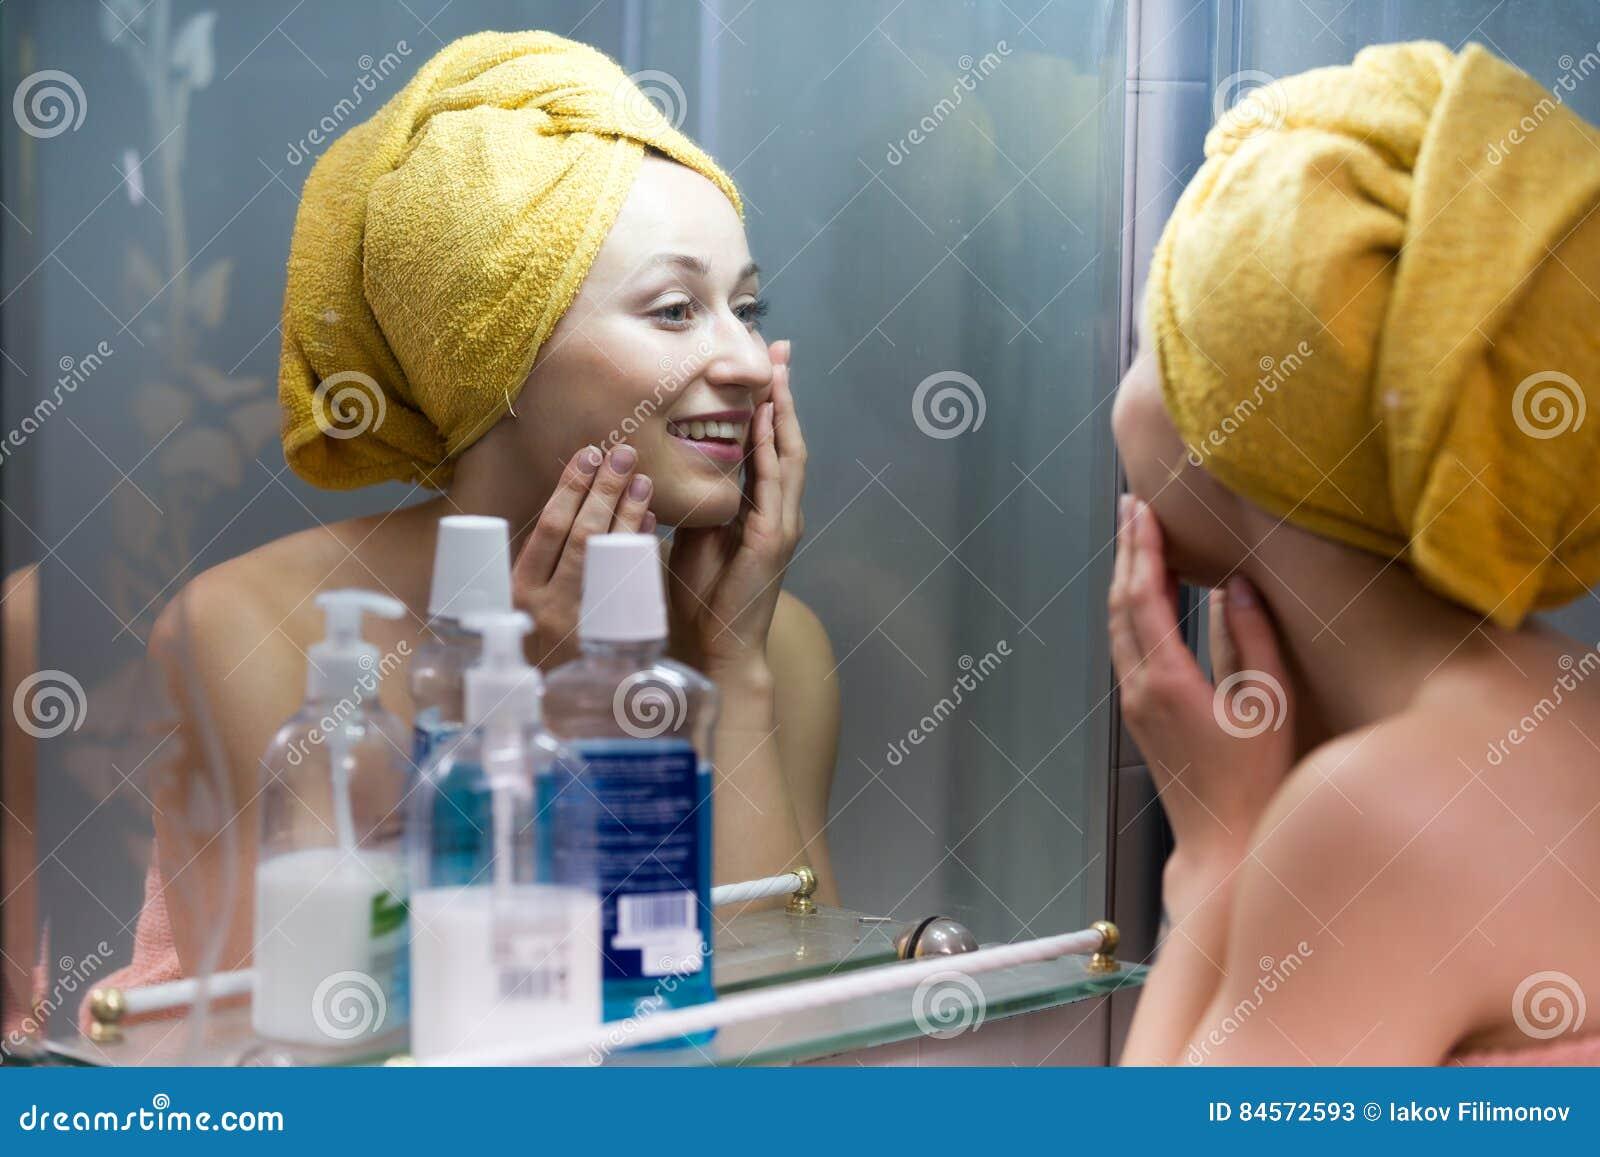 Woman mirror bathroom